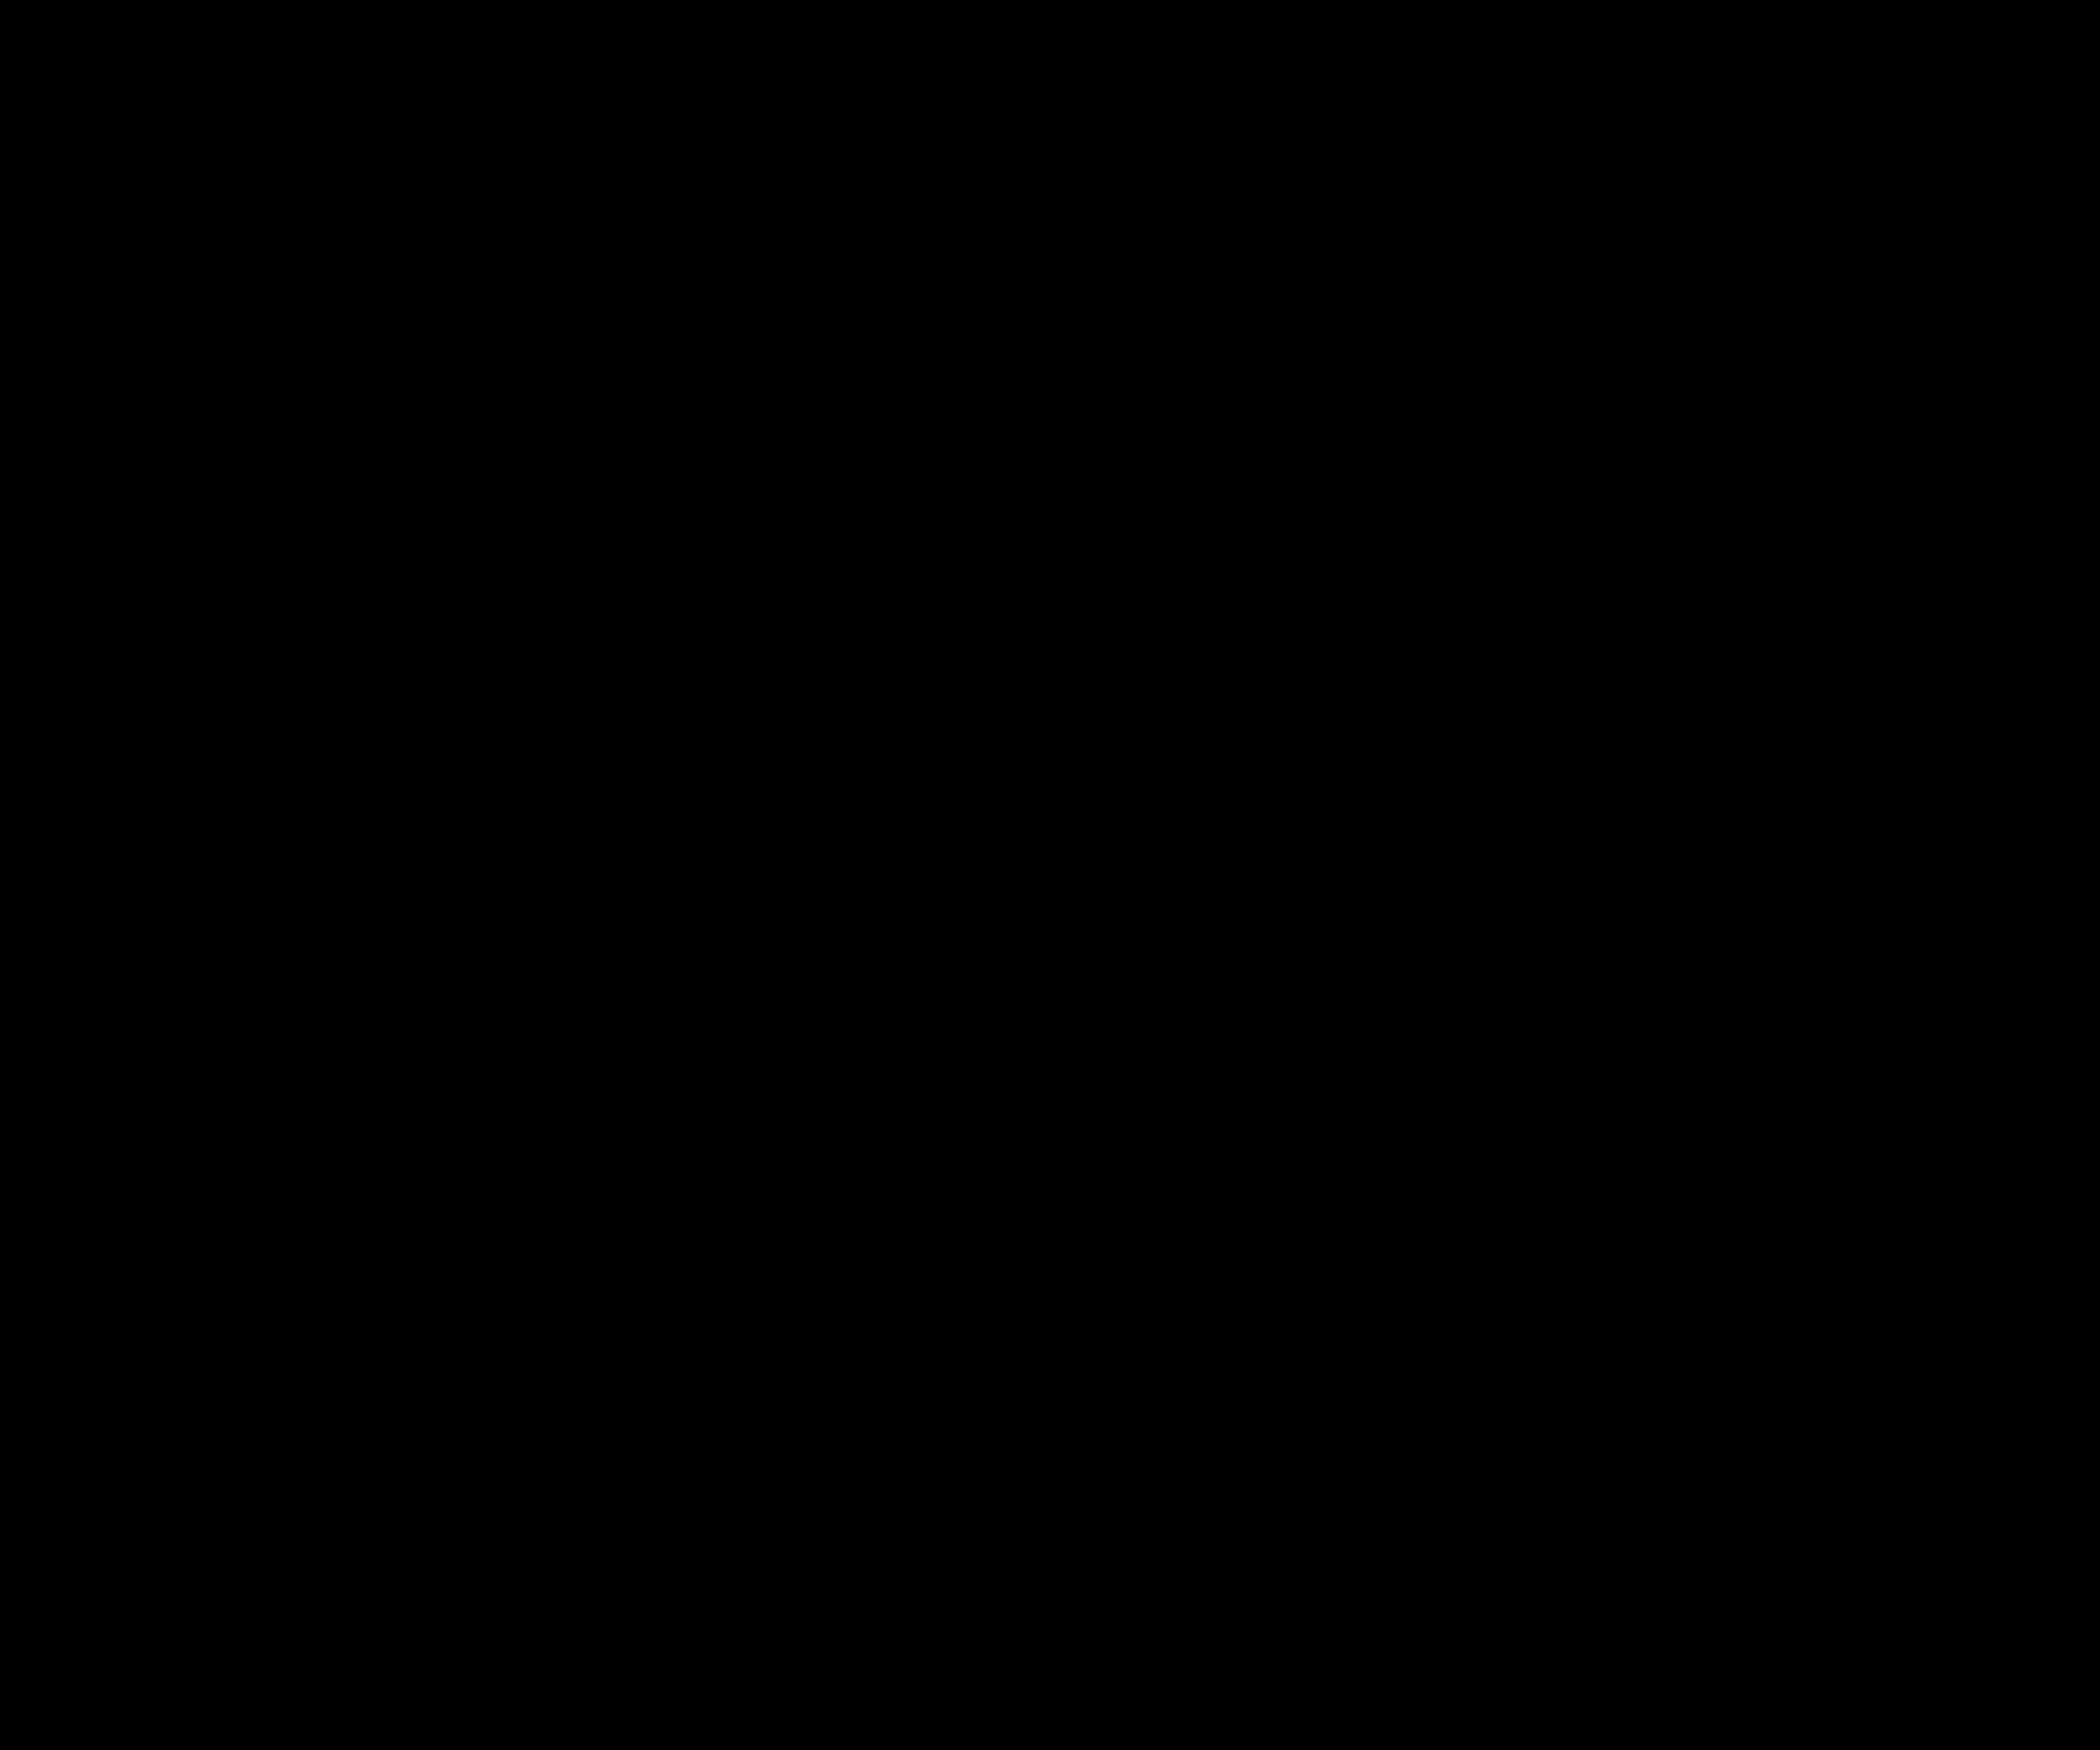 TELECHARGER, INSTALLER et ACTIVER CAPTURE ONE PRO 10